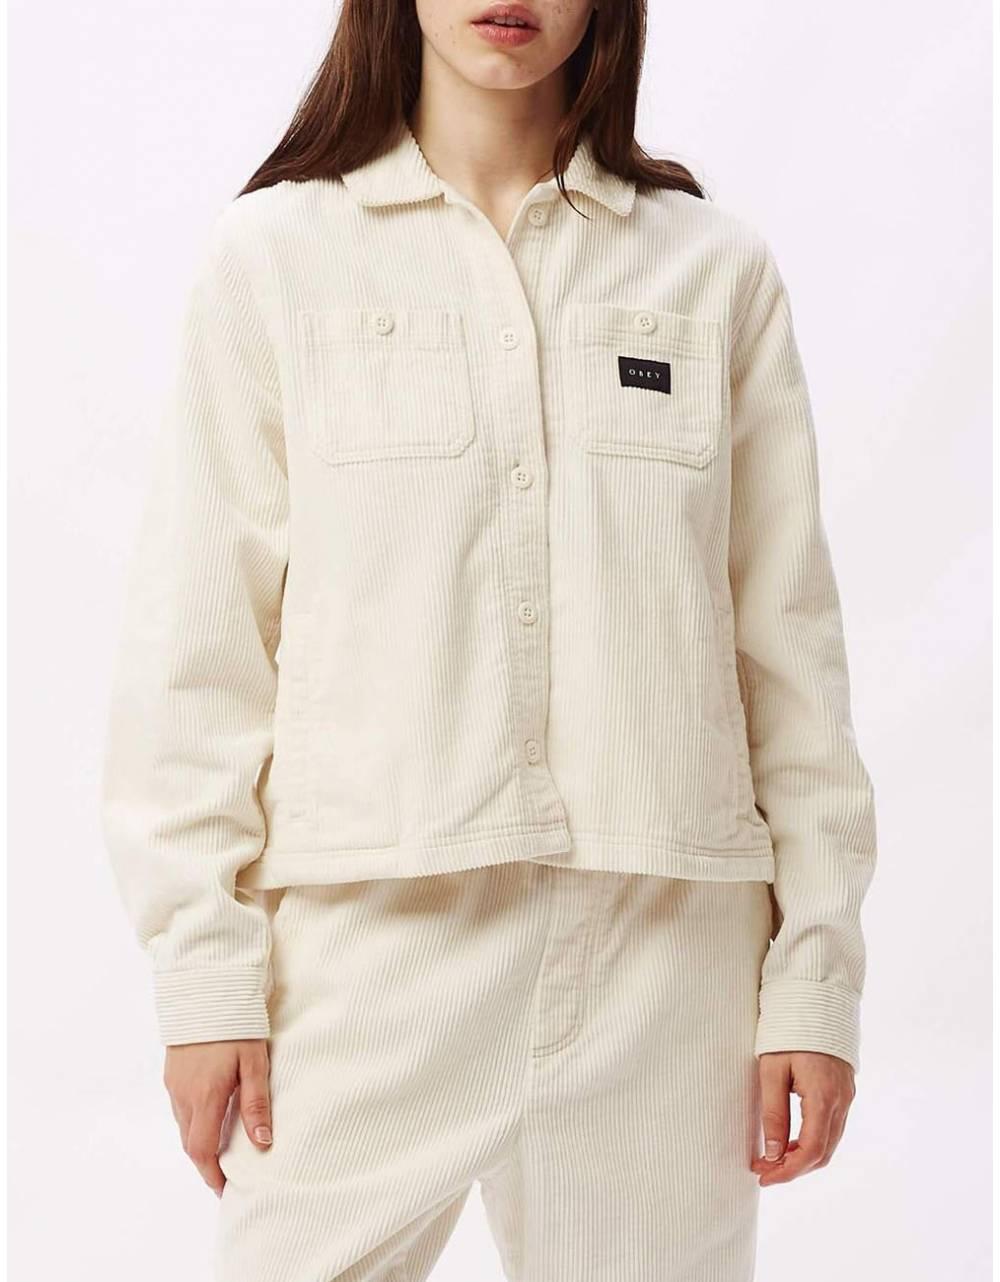 Obey Woman splash cord jacket - bone obey Jacket 95,08€